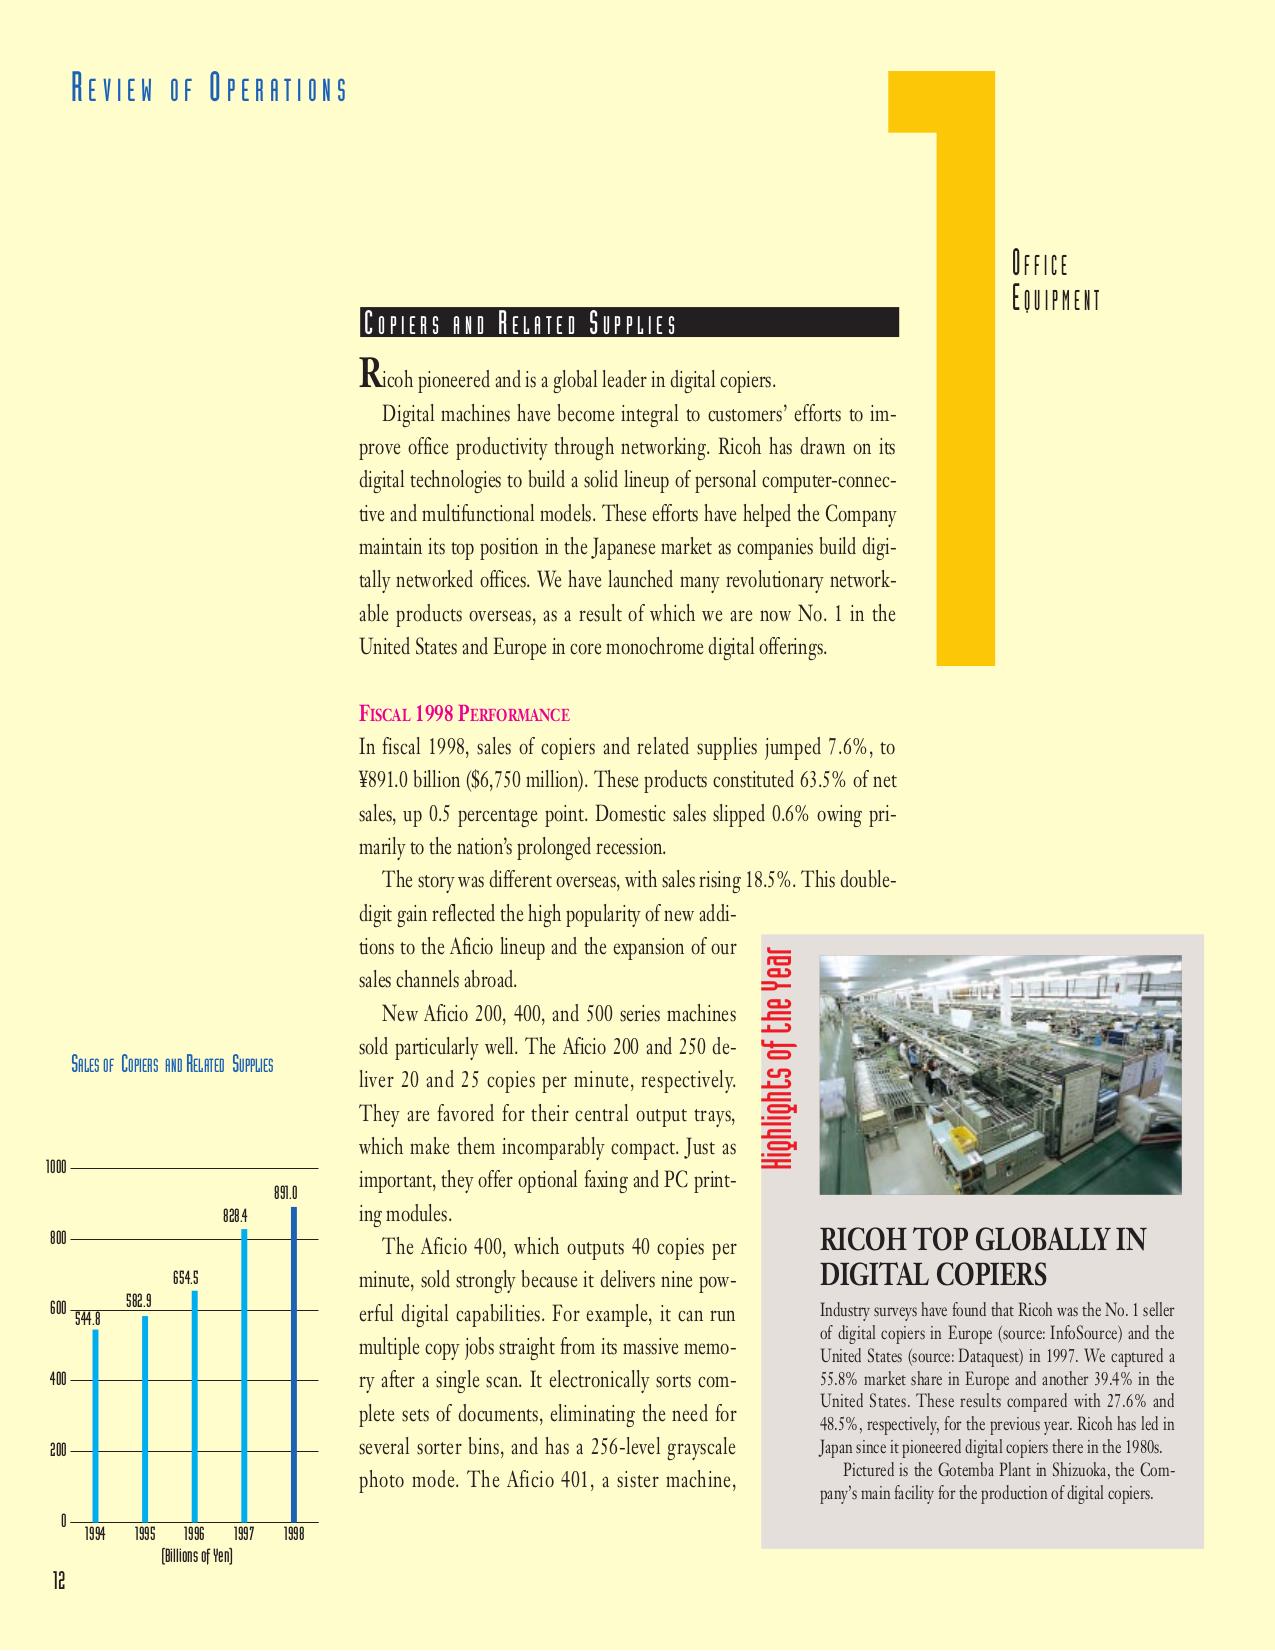 pdf for Ricoh Fax Machine fax4700l manual